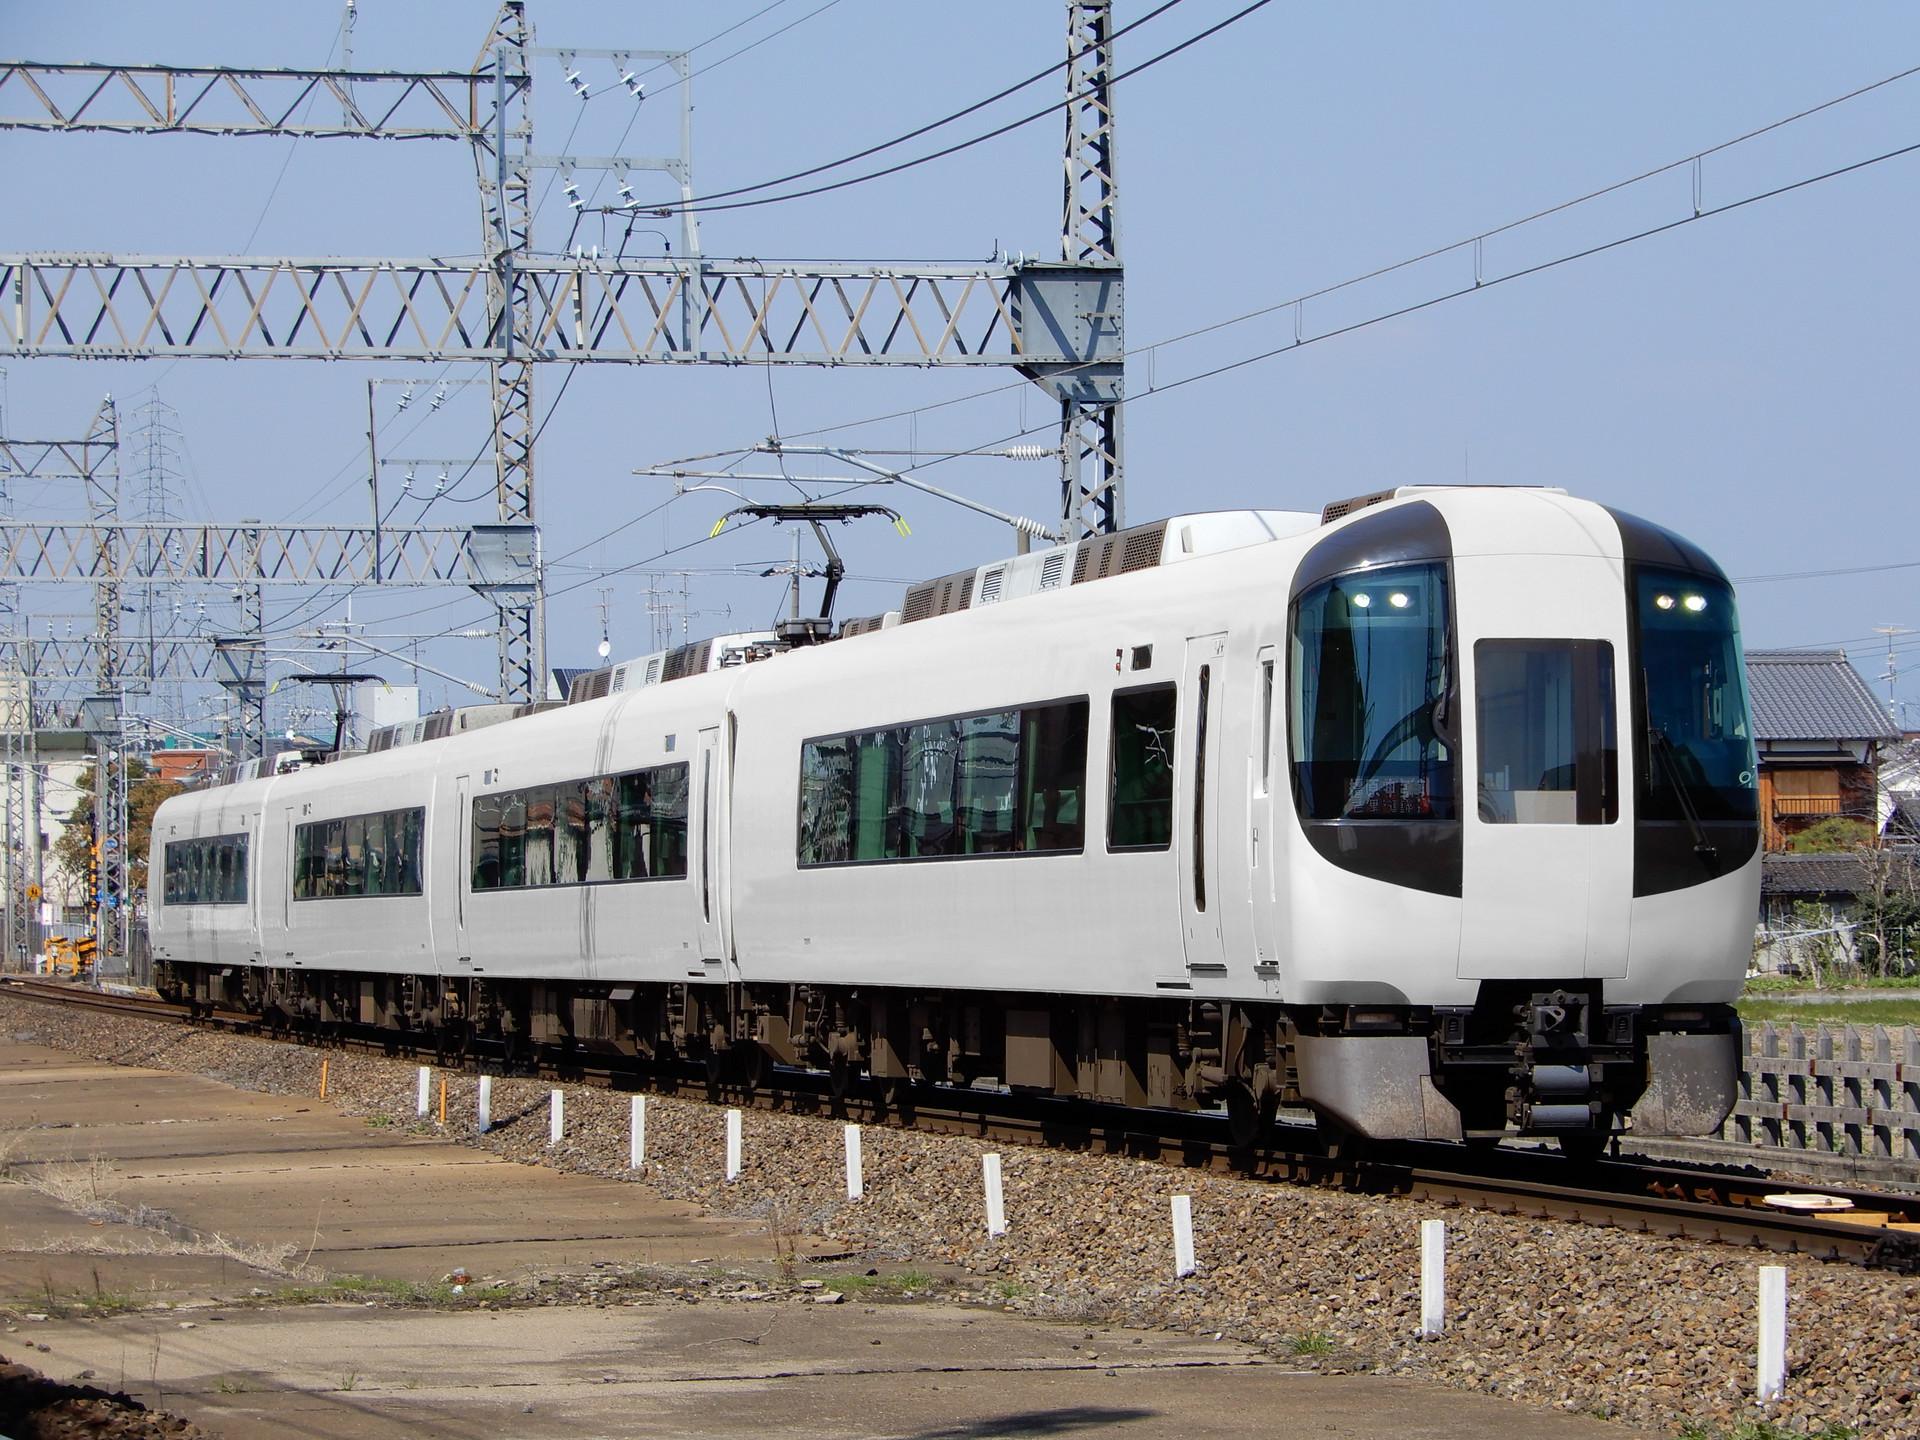 近畿日本鉄道 22600系の色変え用素体